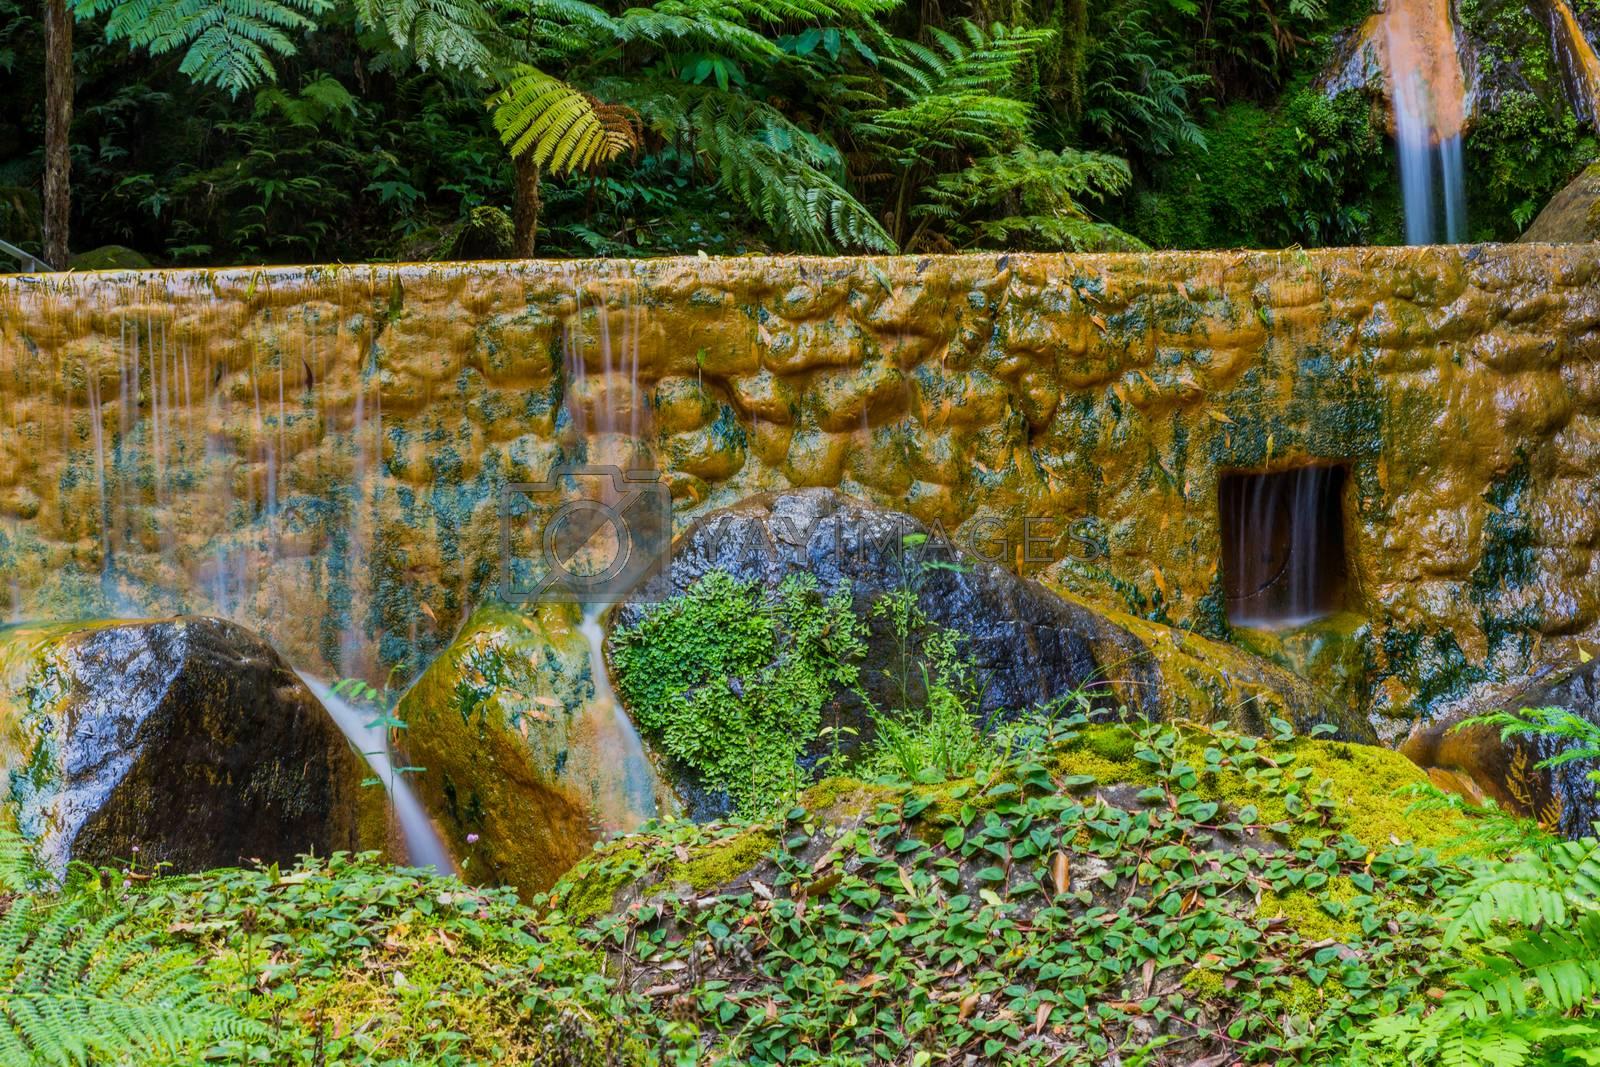 Waterfall in Caldeira Velha, ribeira grande, Natural Spa, Sao Miguel, Azores, Portugal